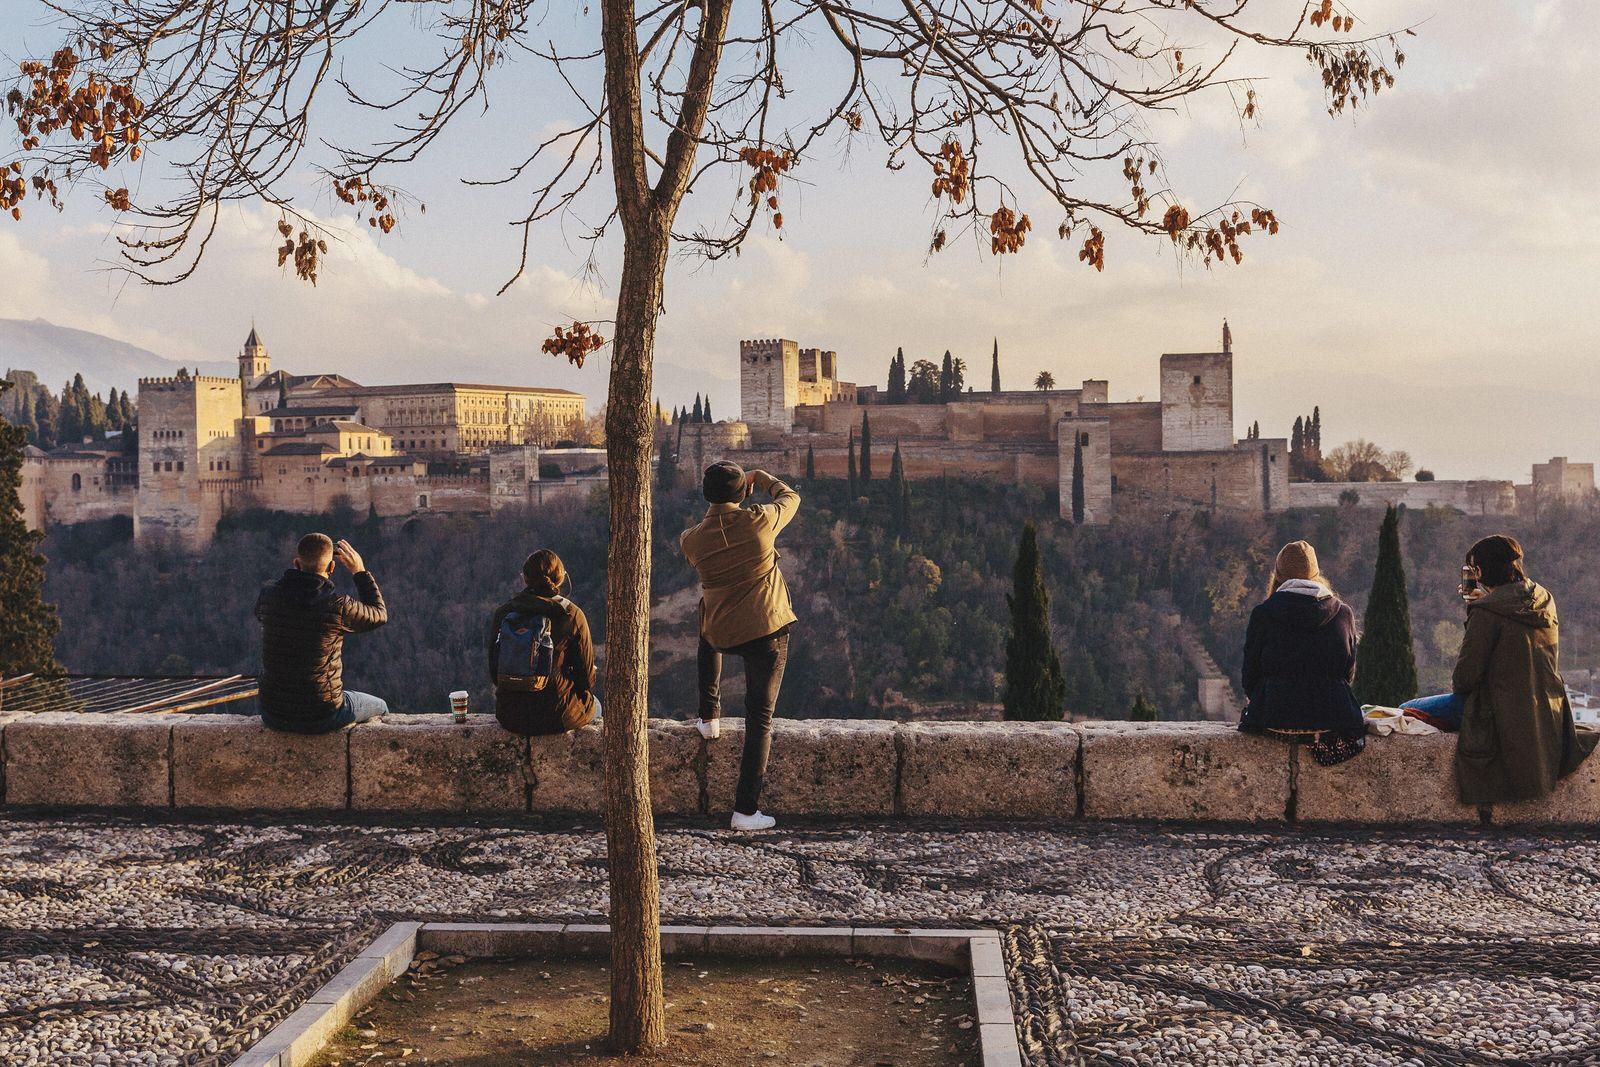 A city guide to Granada, Spain